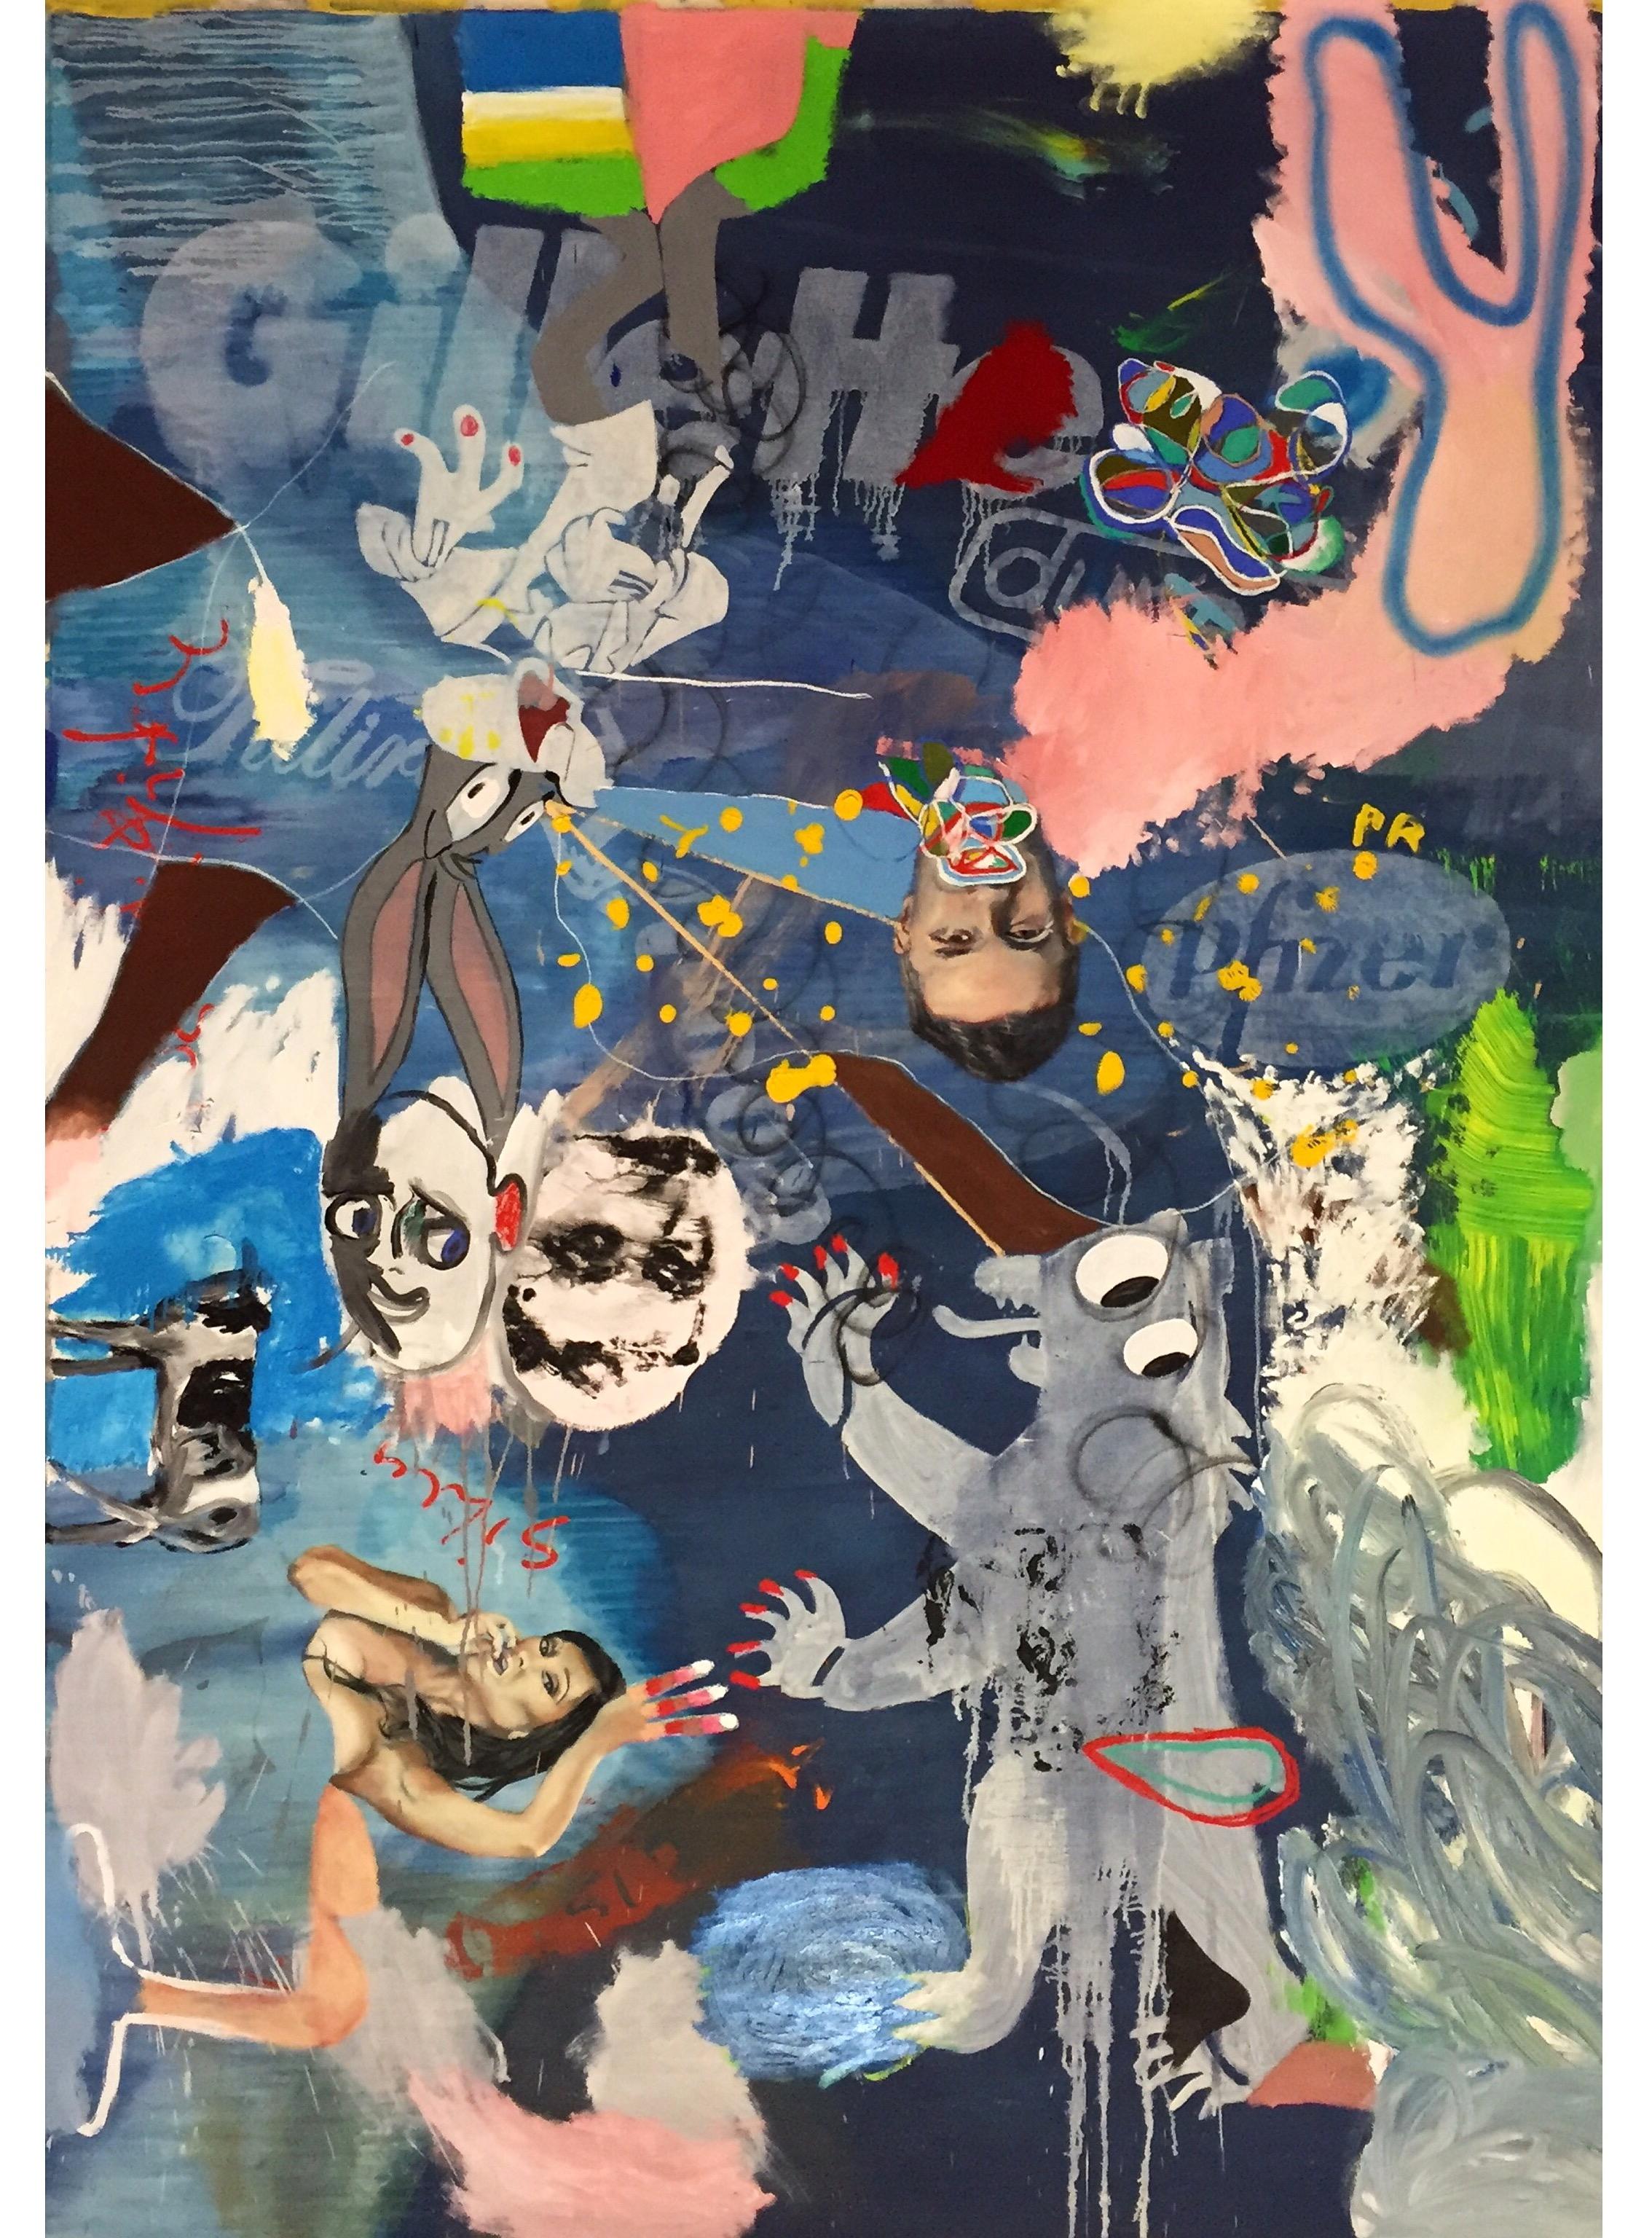 Oil, Acrylic, and Spray Paint on Canvas  98.5 x 71 in  250 x 180 cm